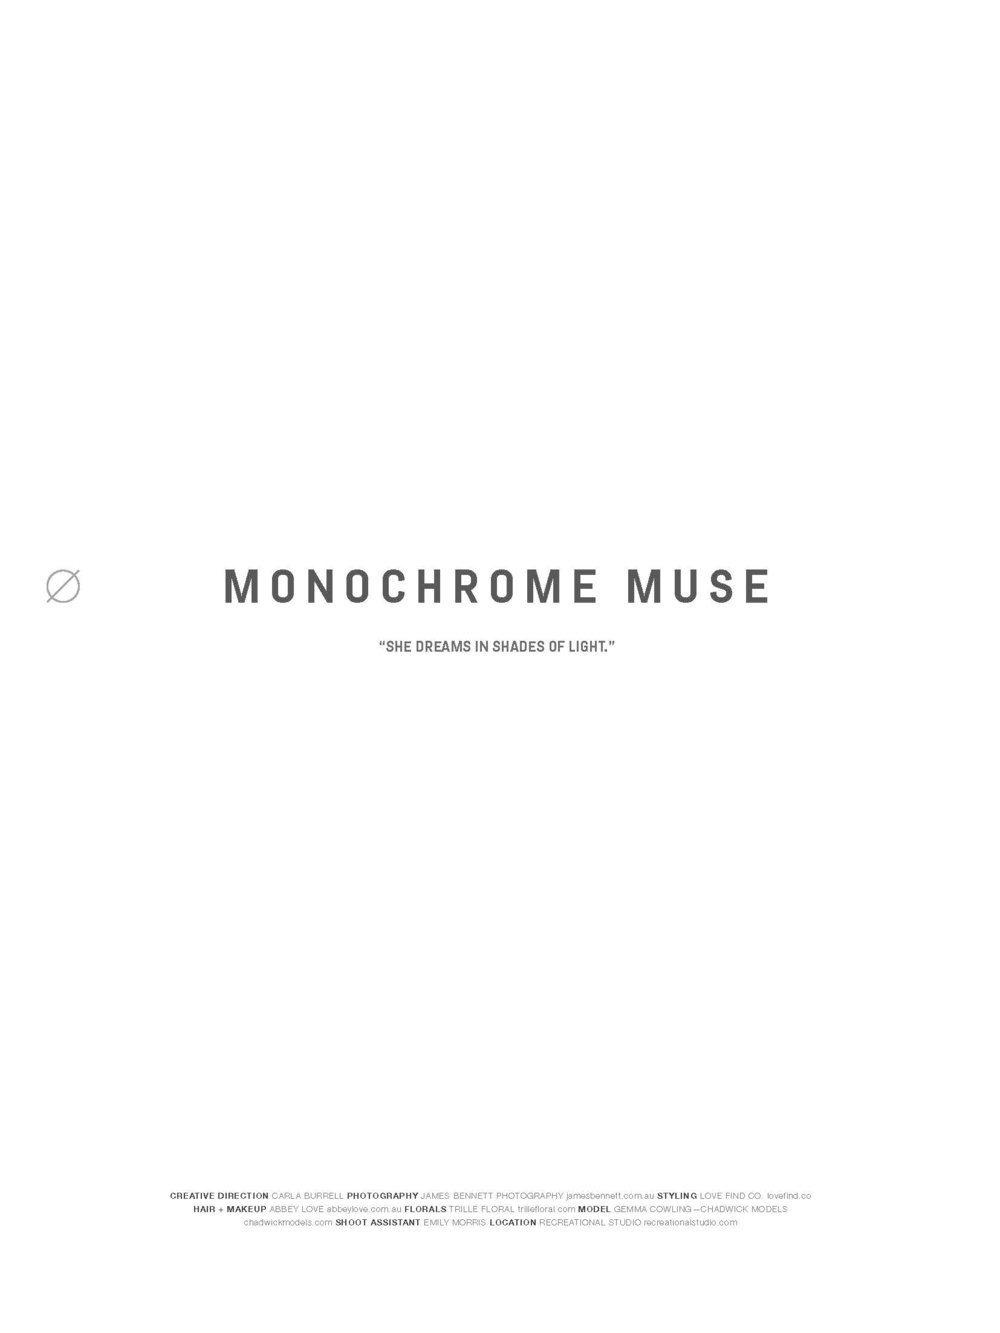 White_#35_Monochrome Muse_Page_01.jpg